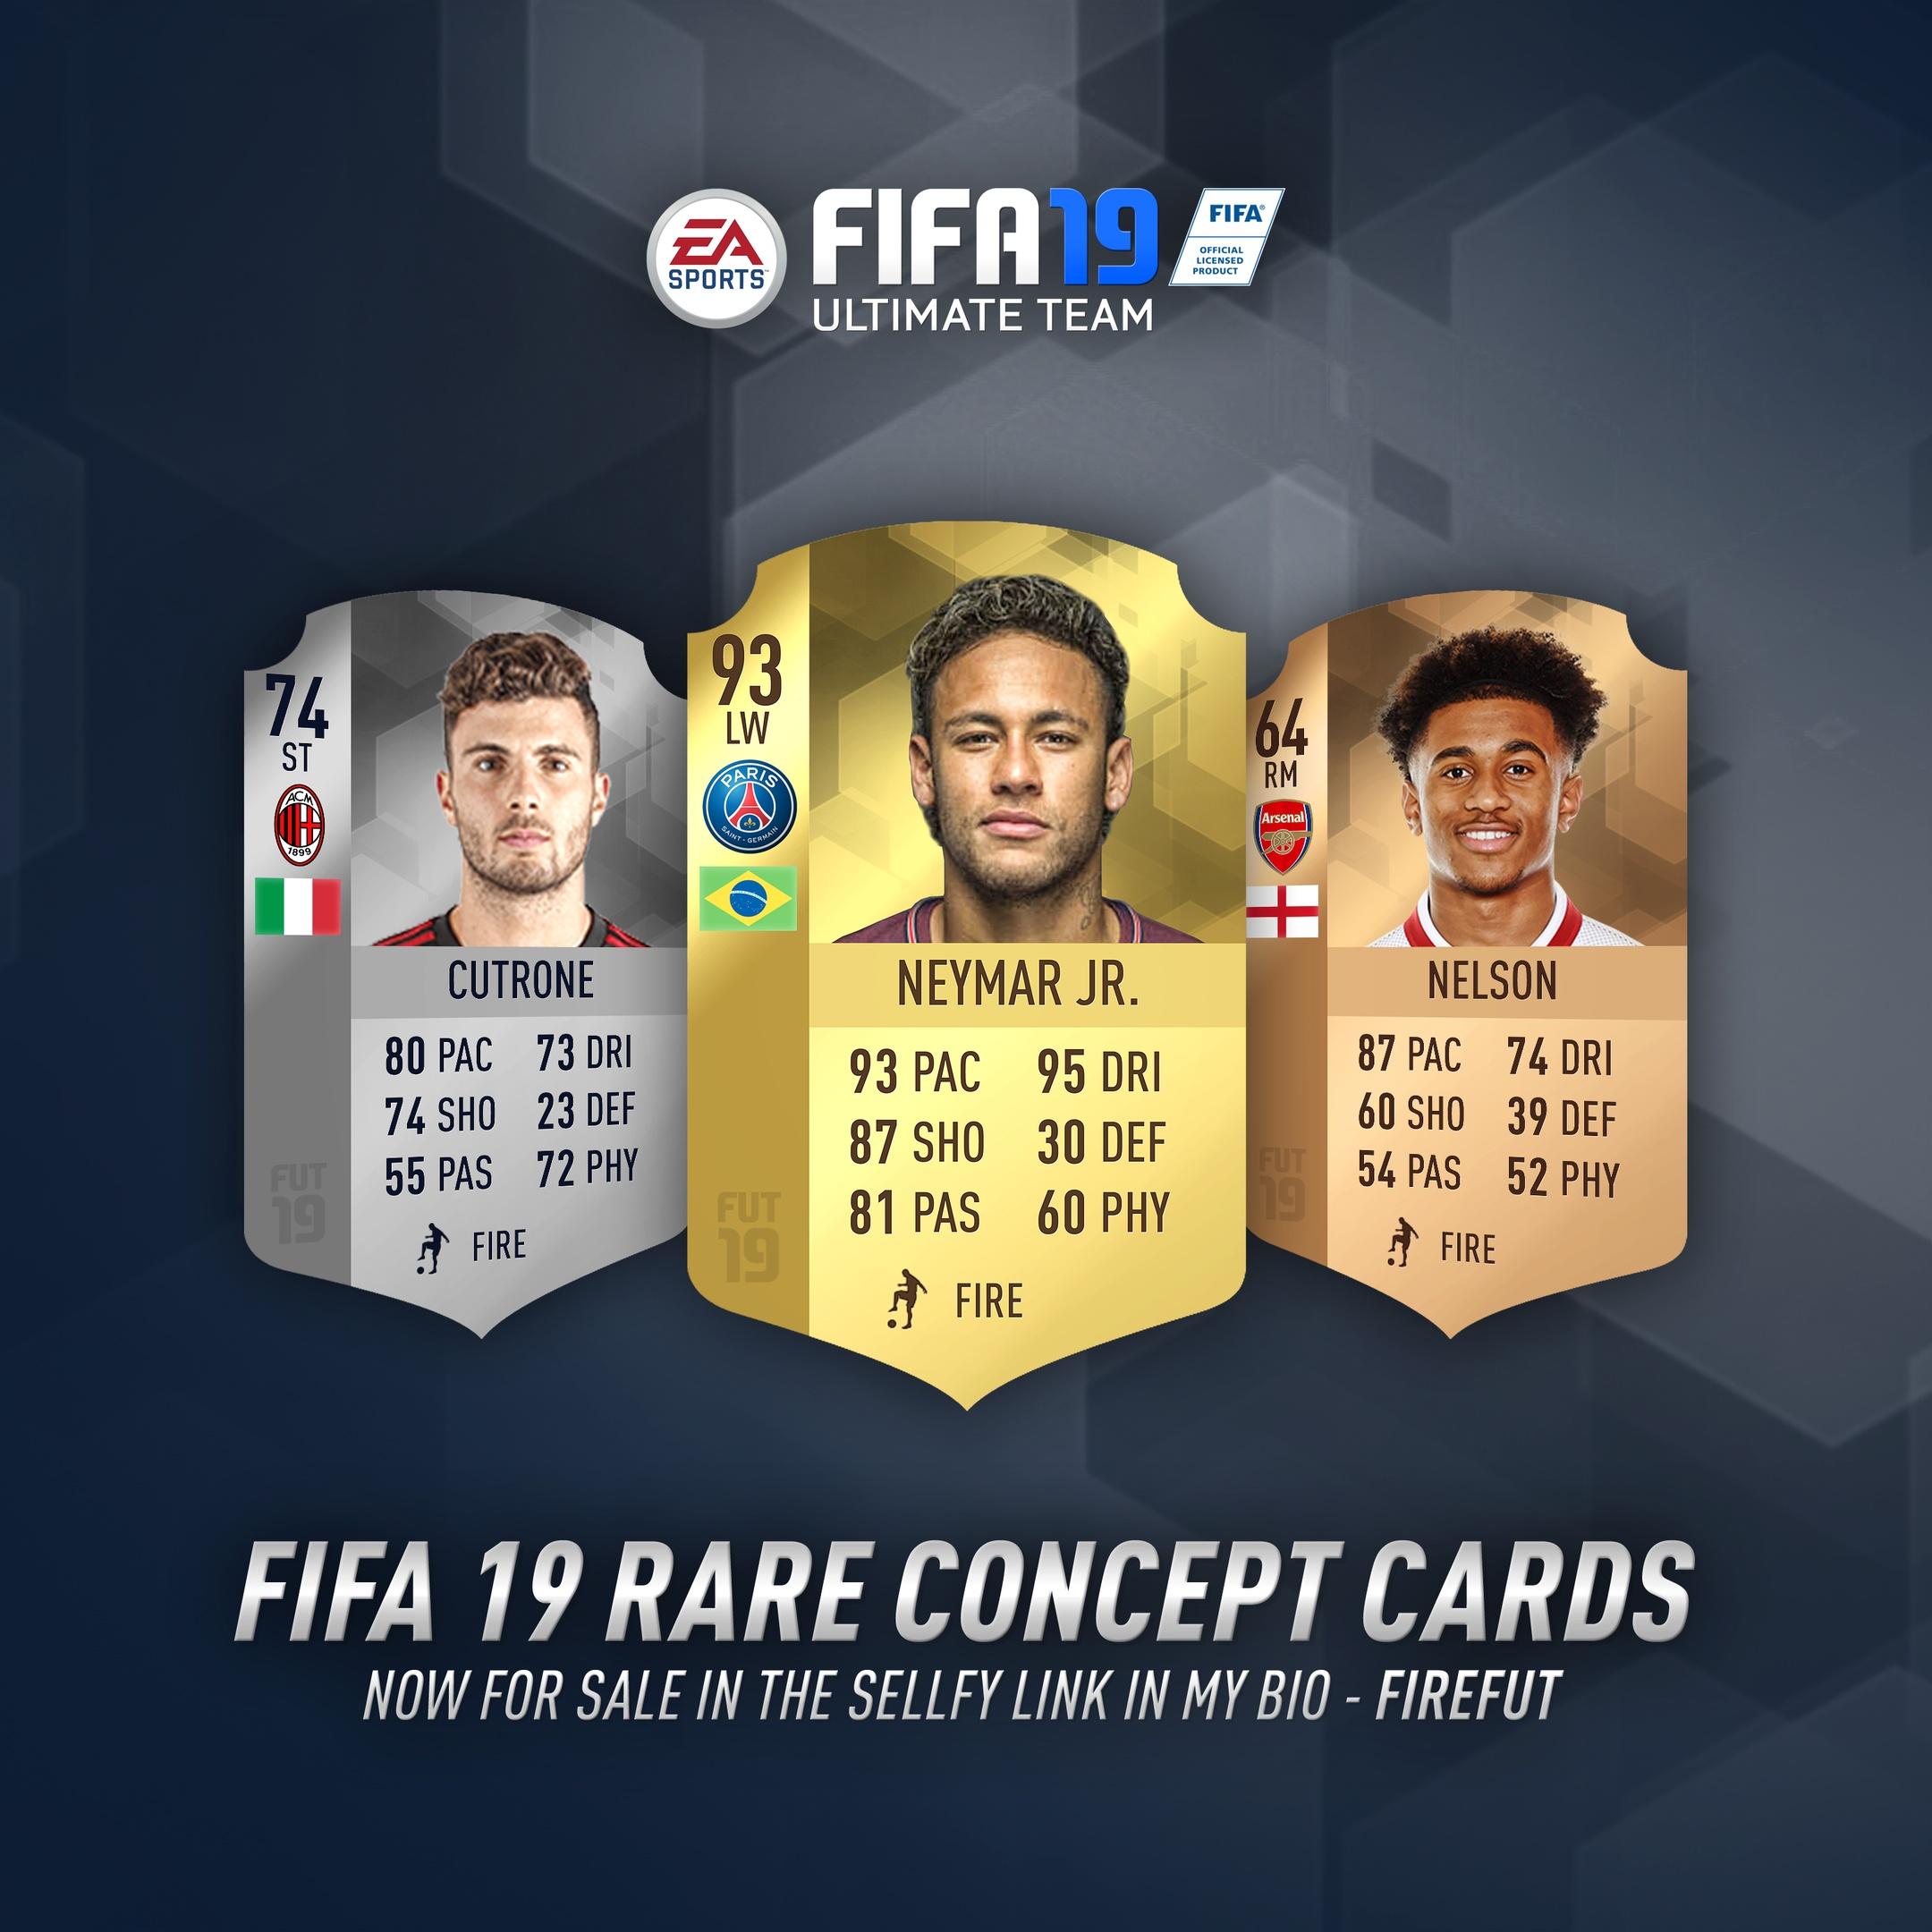 FIFA 19 Rare Concept Card Designs